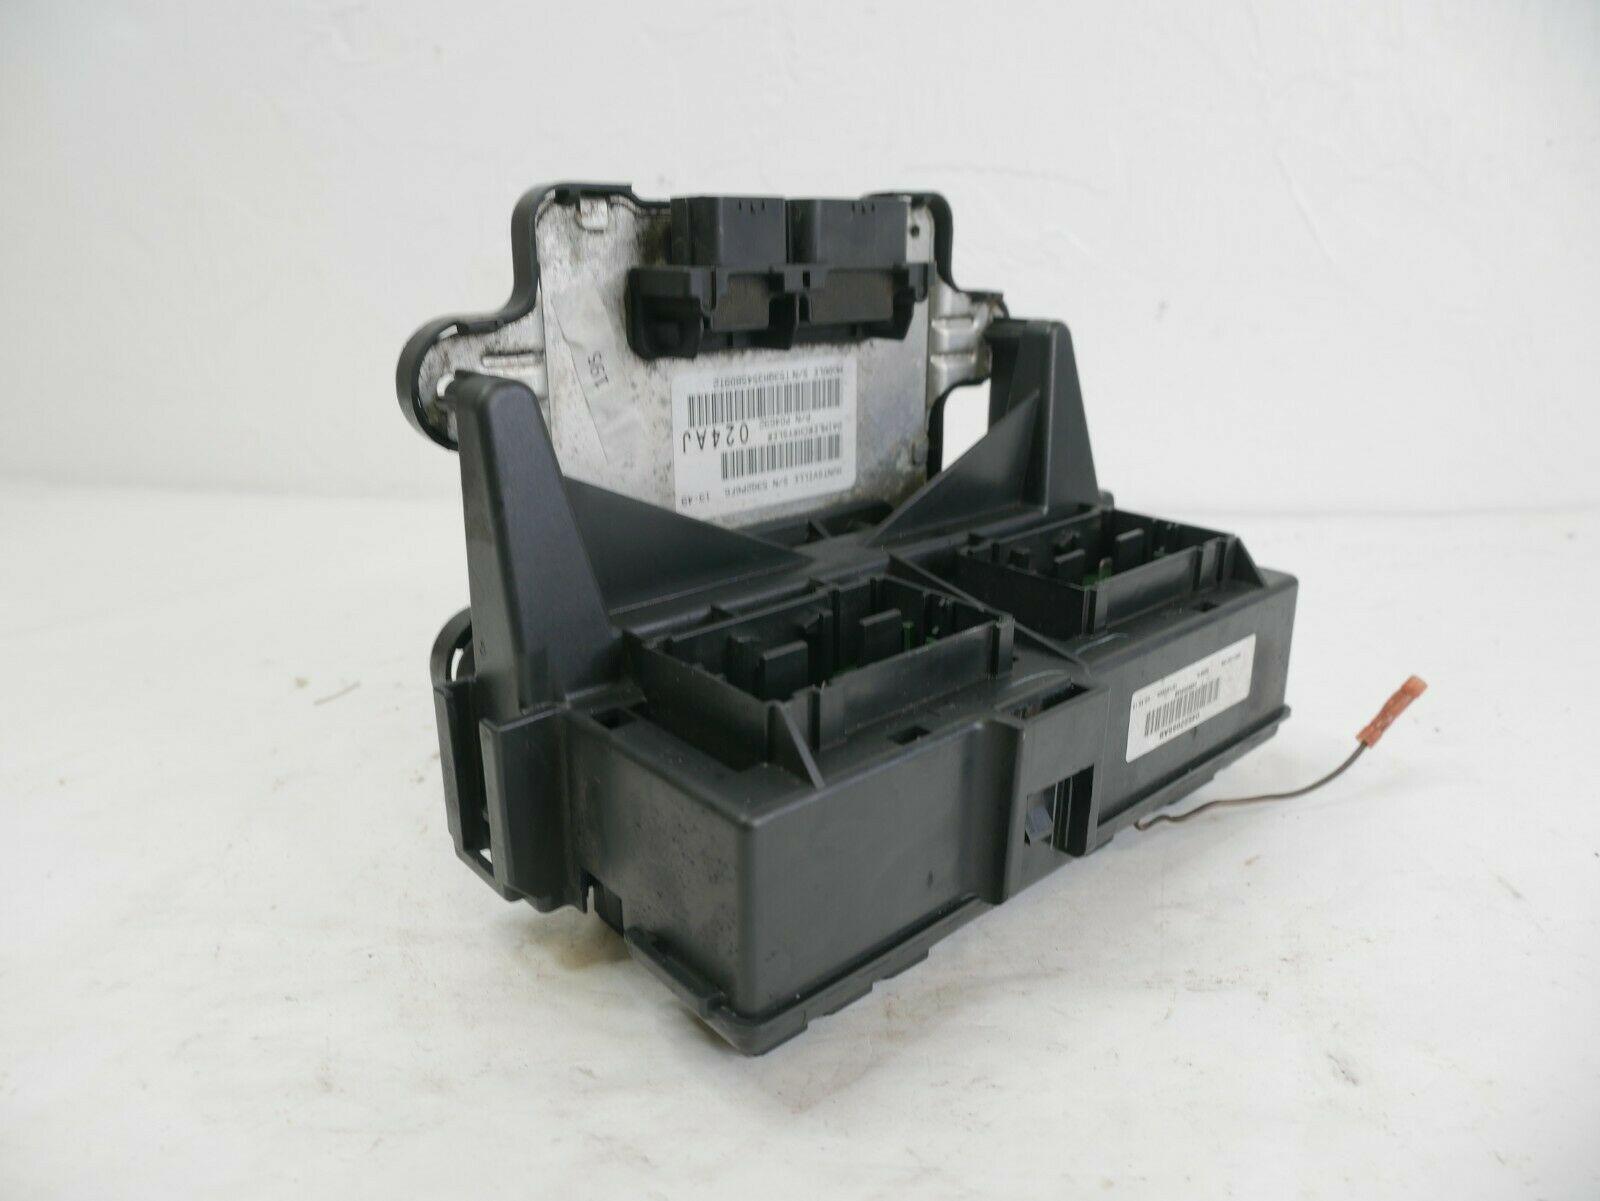 06 2006 Jeep Commander Tipm Power Supply Module Fuse Relay Box P04692015aj